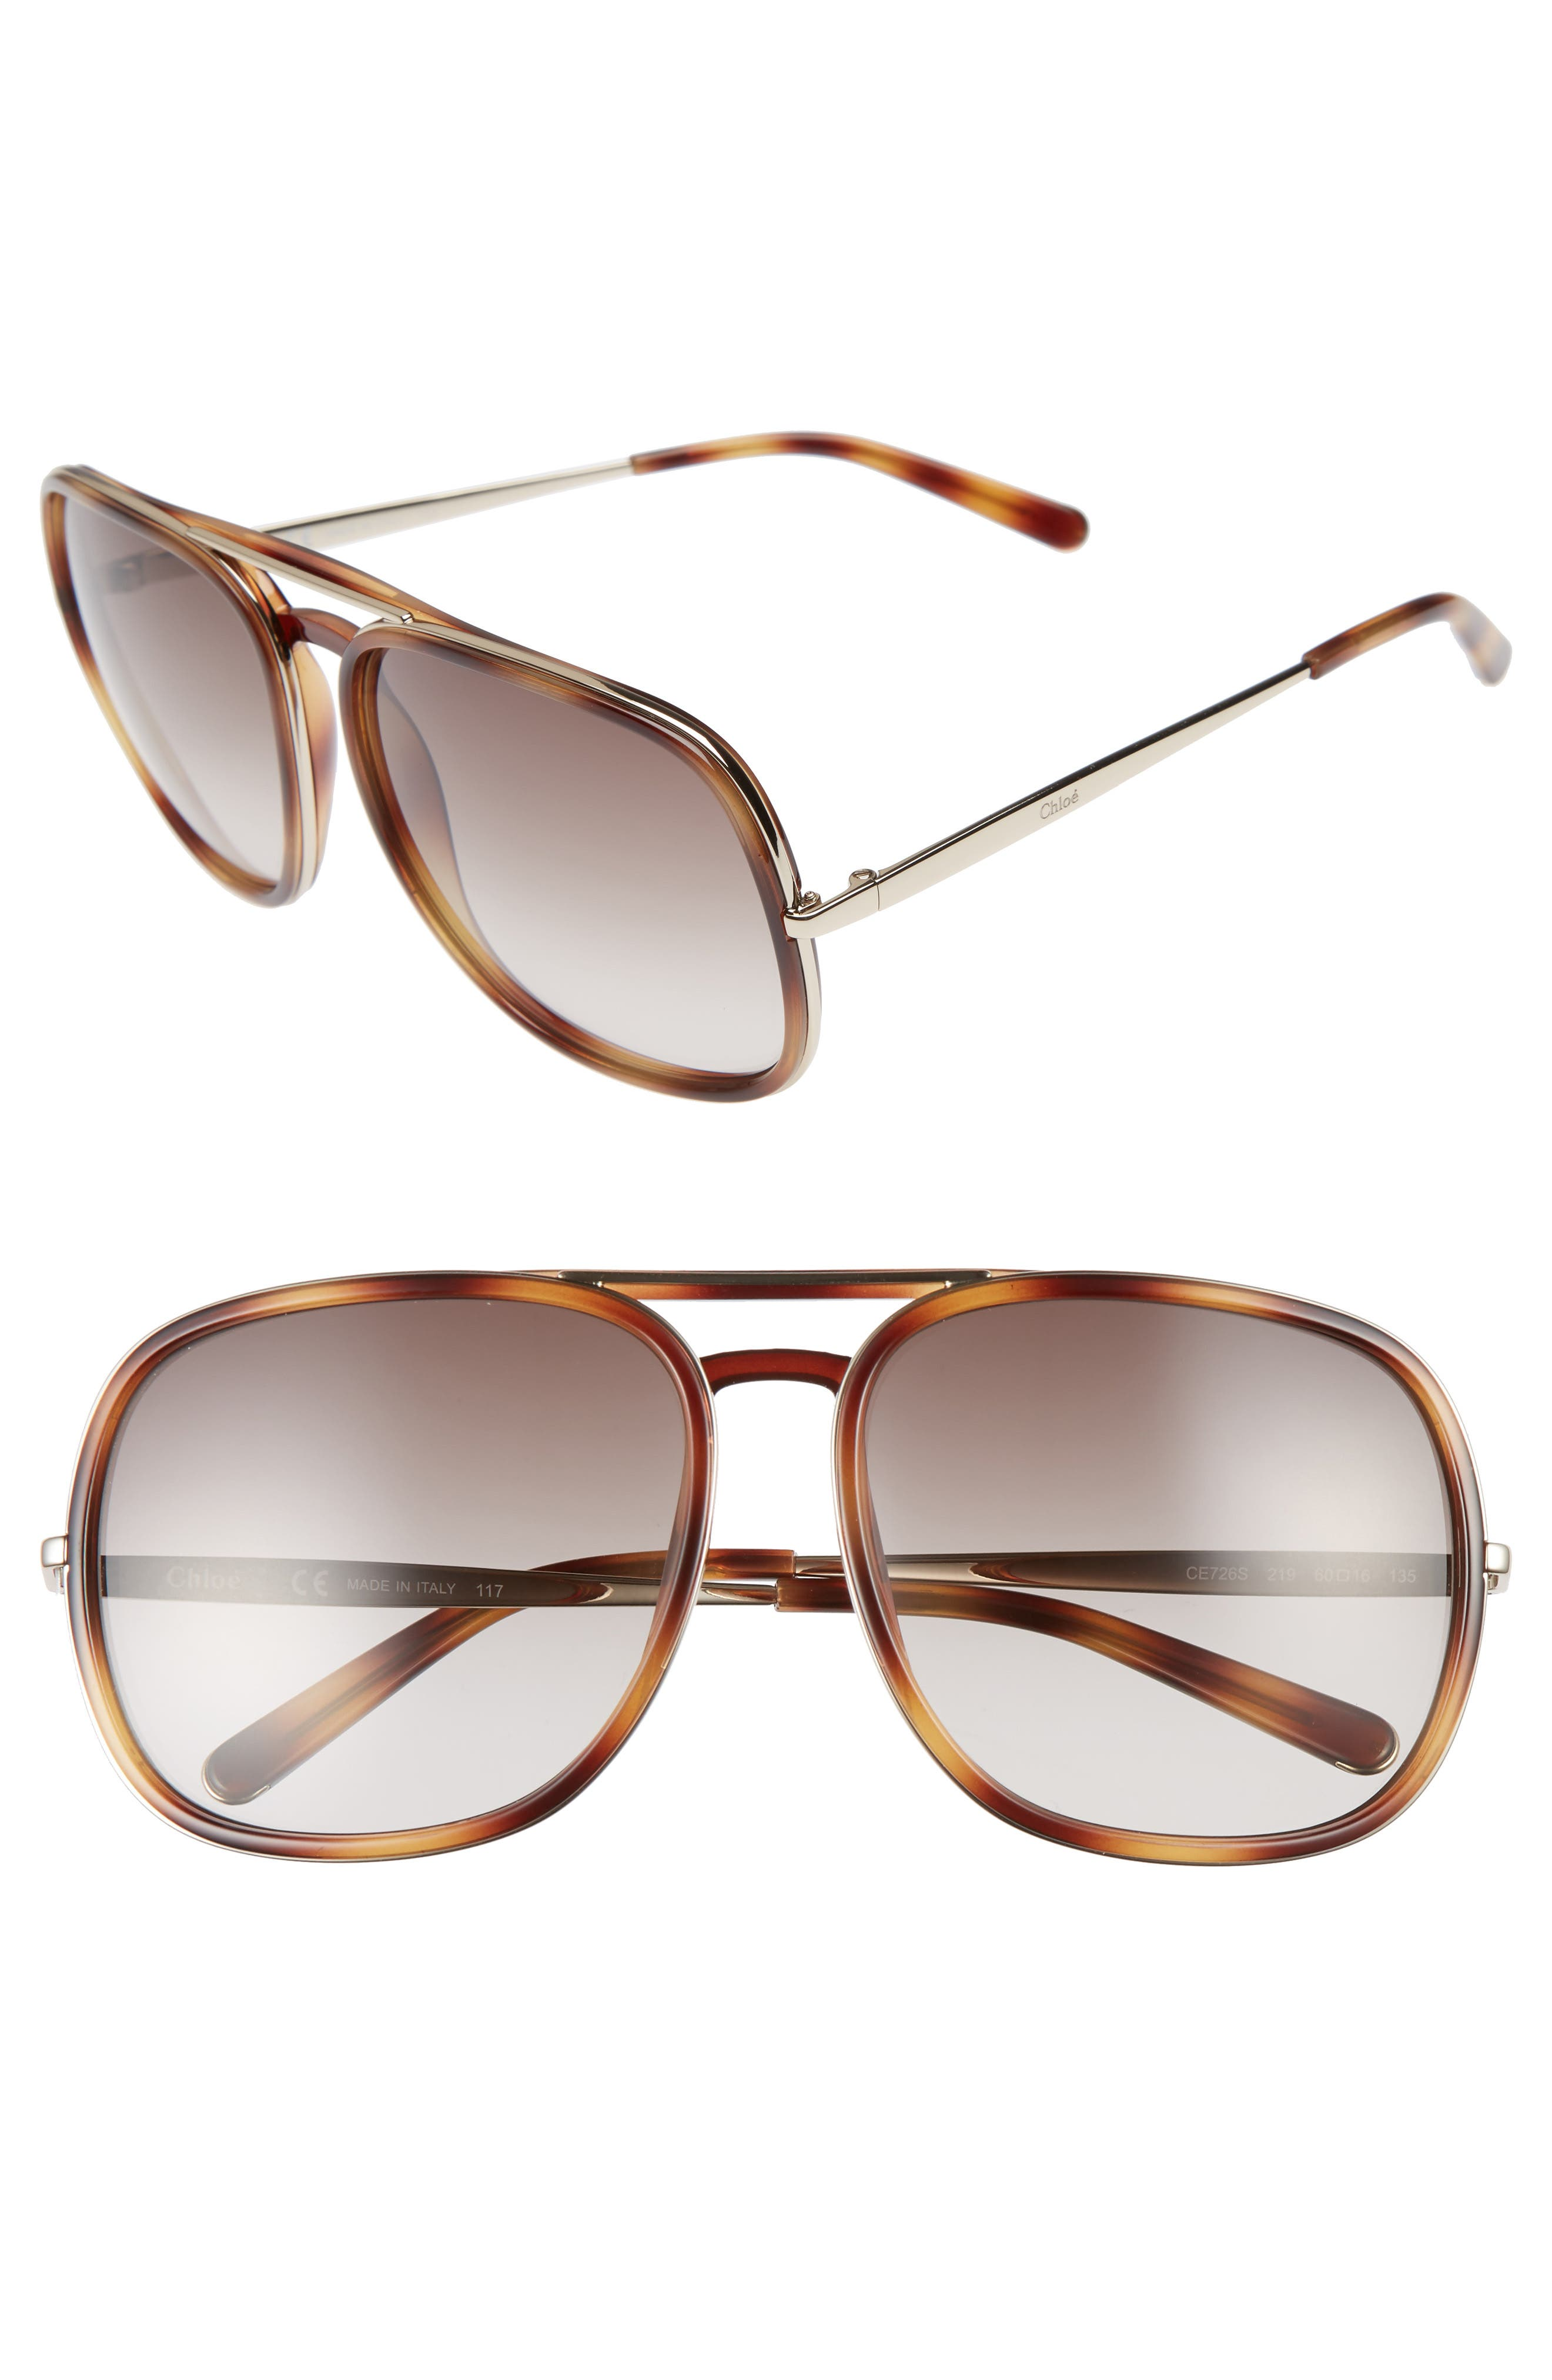 60mm Gradient Lens Navigator Sunglasses,                         Main,                         color, Tortoise